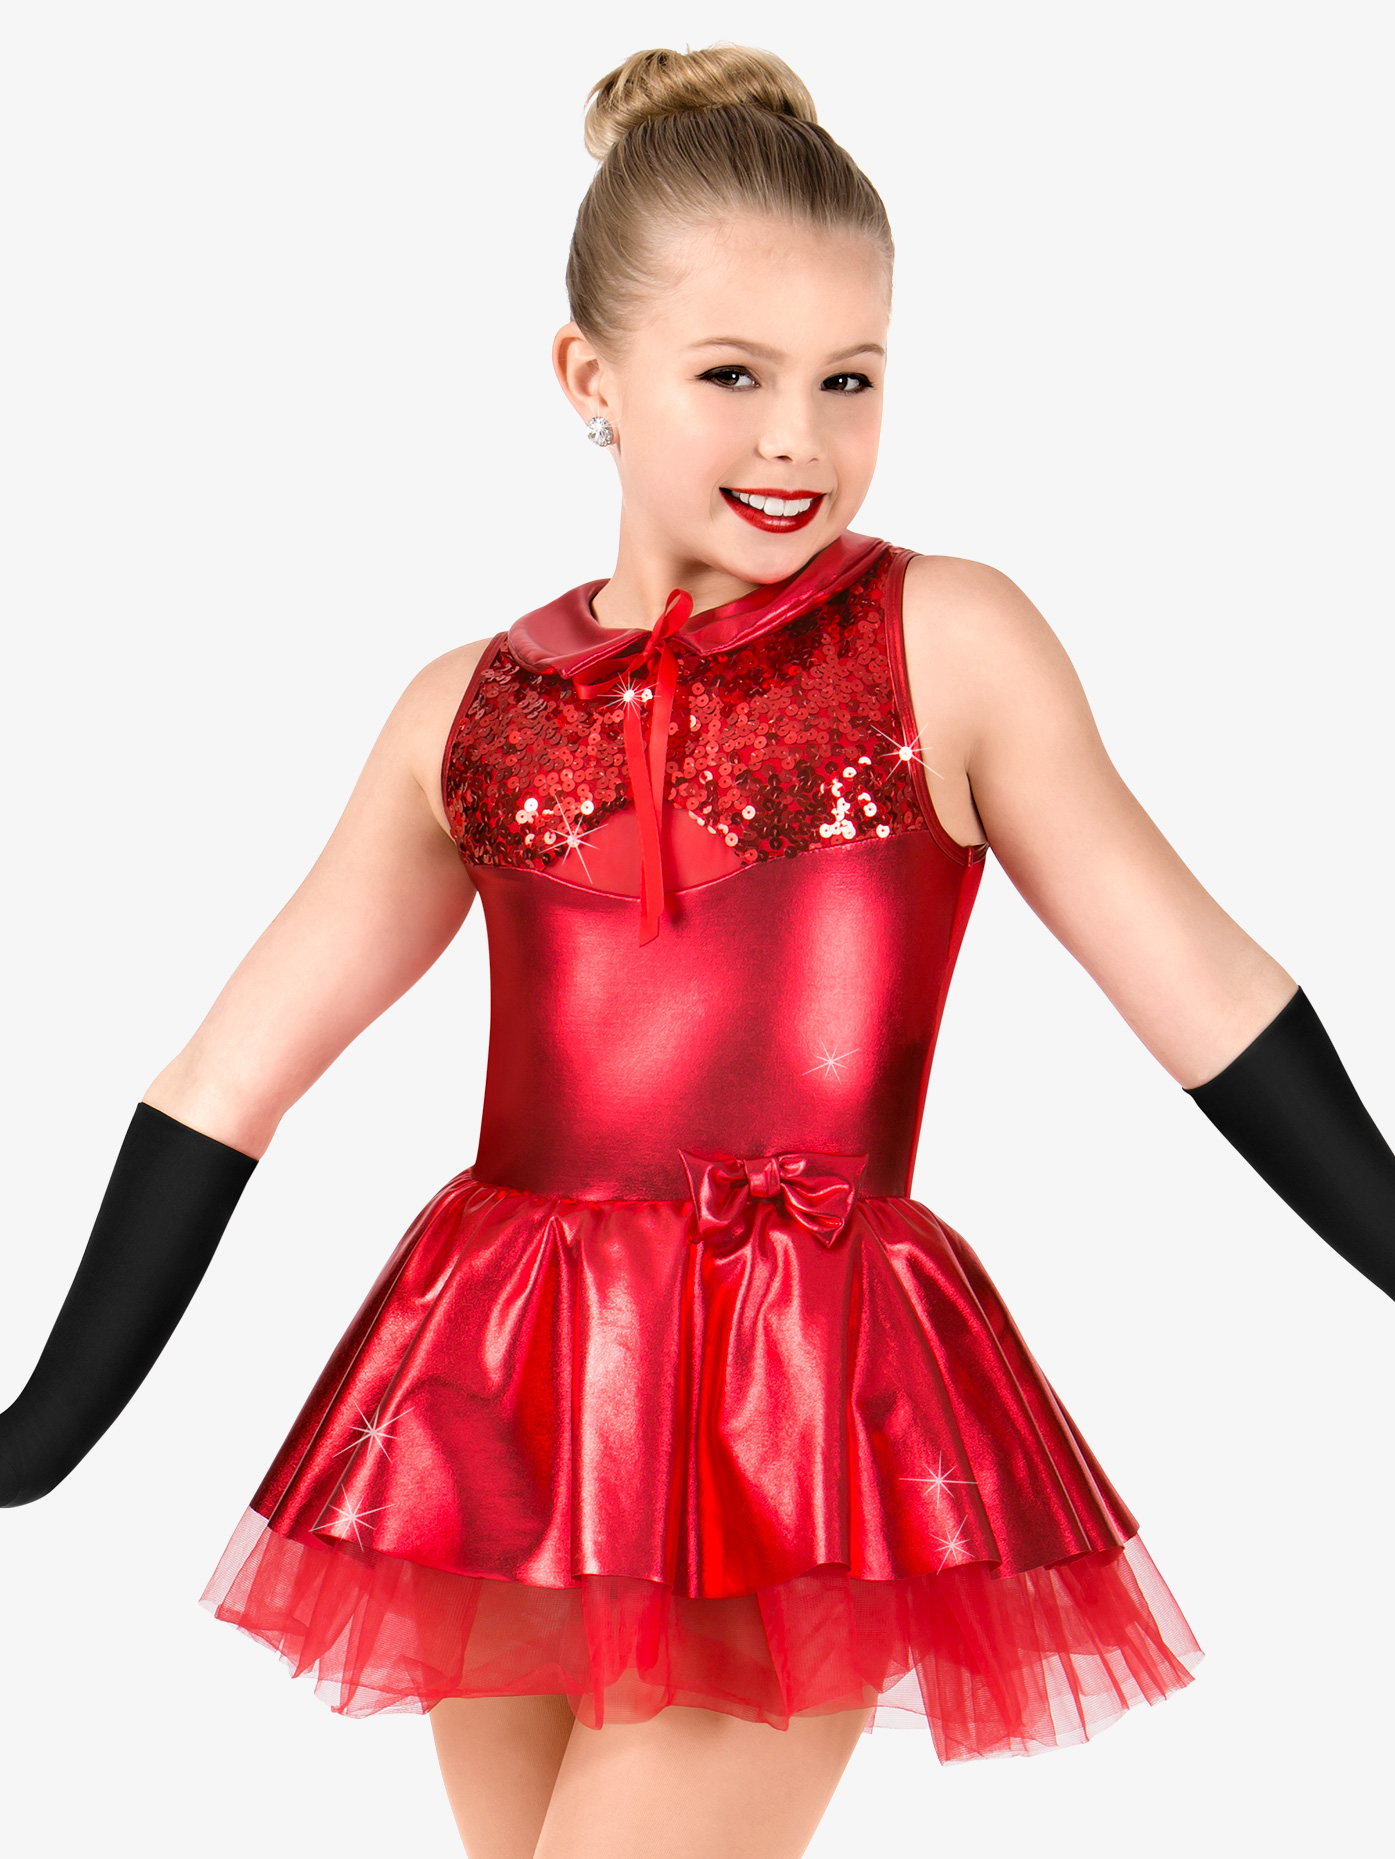 Gracie Girls Metallic Tank Performance Tutu Dress N7430C